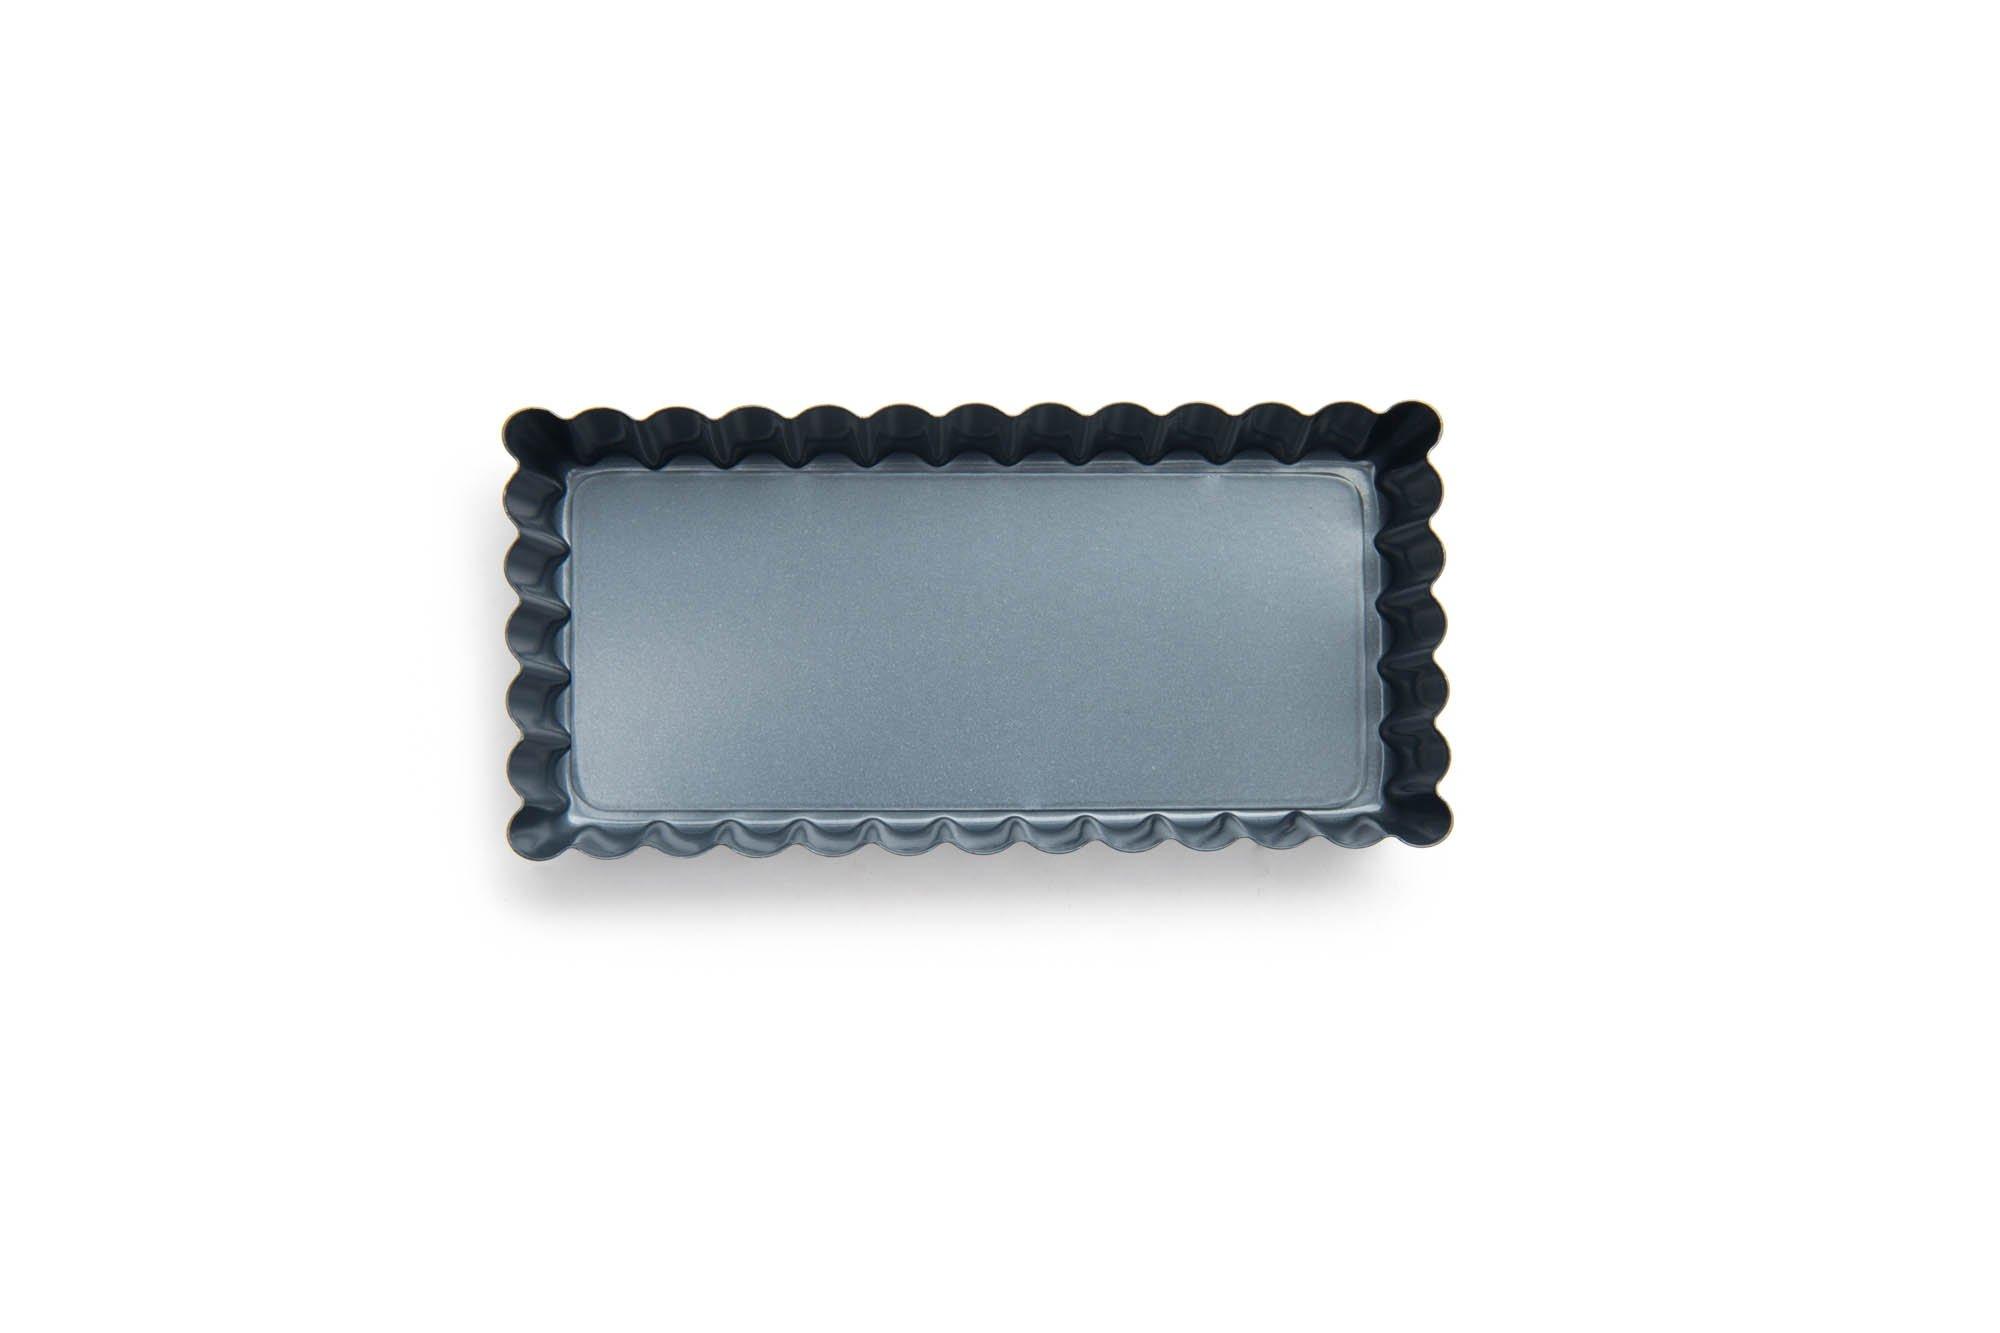 Fox Run 44491 Mini Rectangular Loose Bottom Tart/Quiche Pan, Preferred Non-Stick, 4.5-Inch